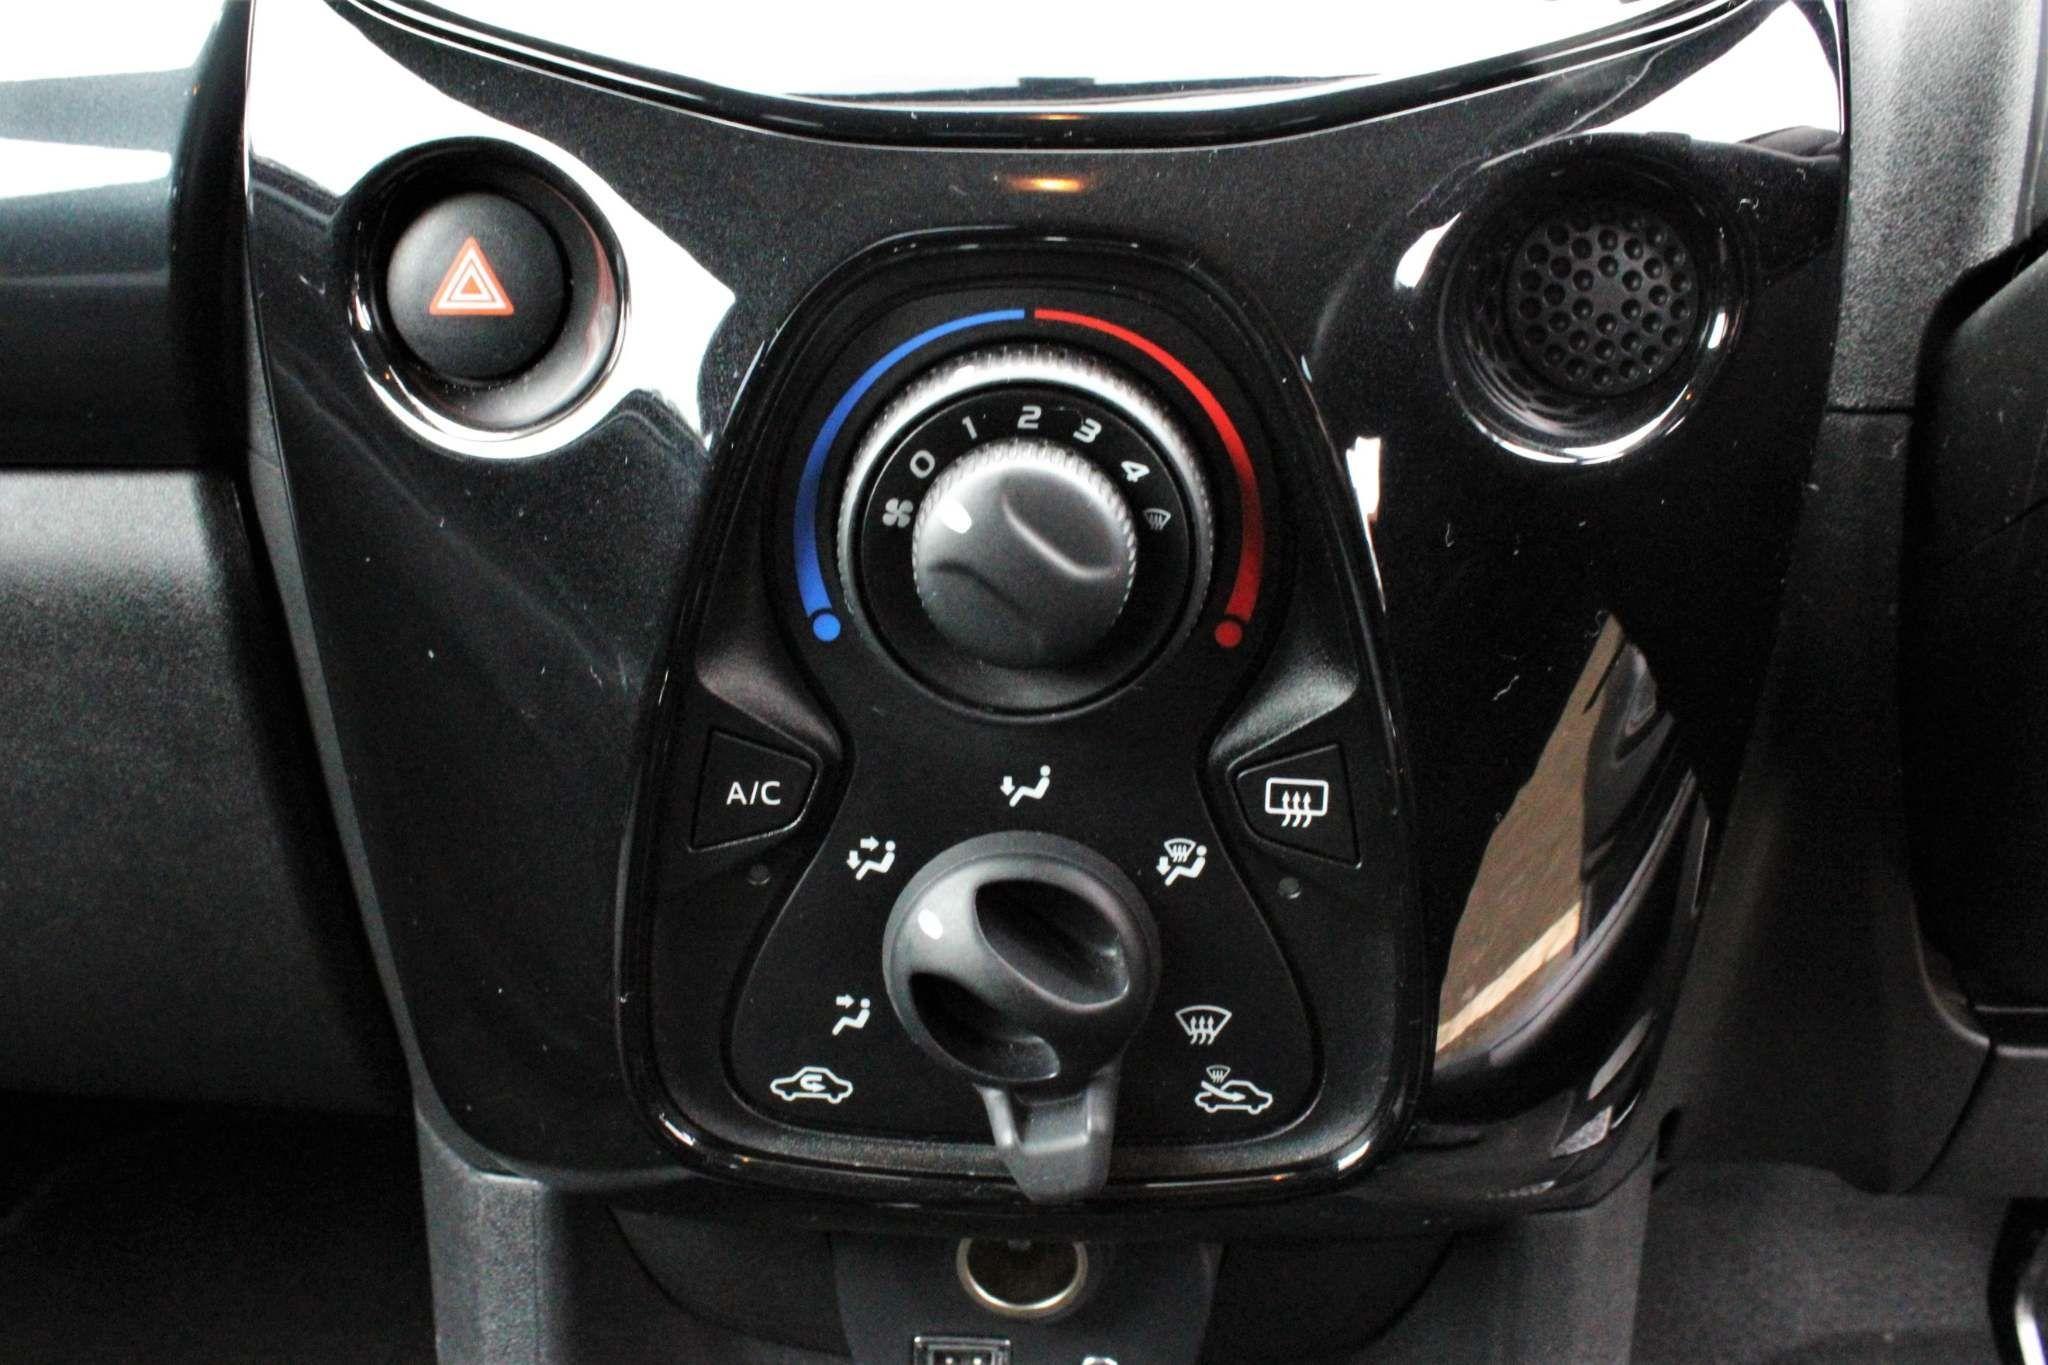 Toyota Aygo 1.0 VVT-i x-pression 5dr EU5